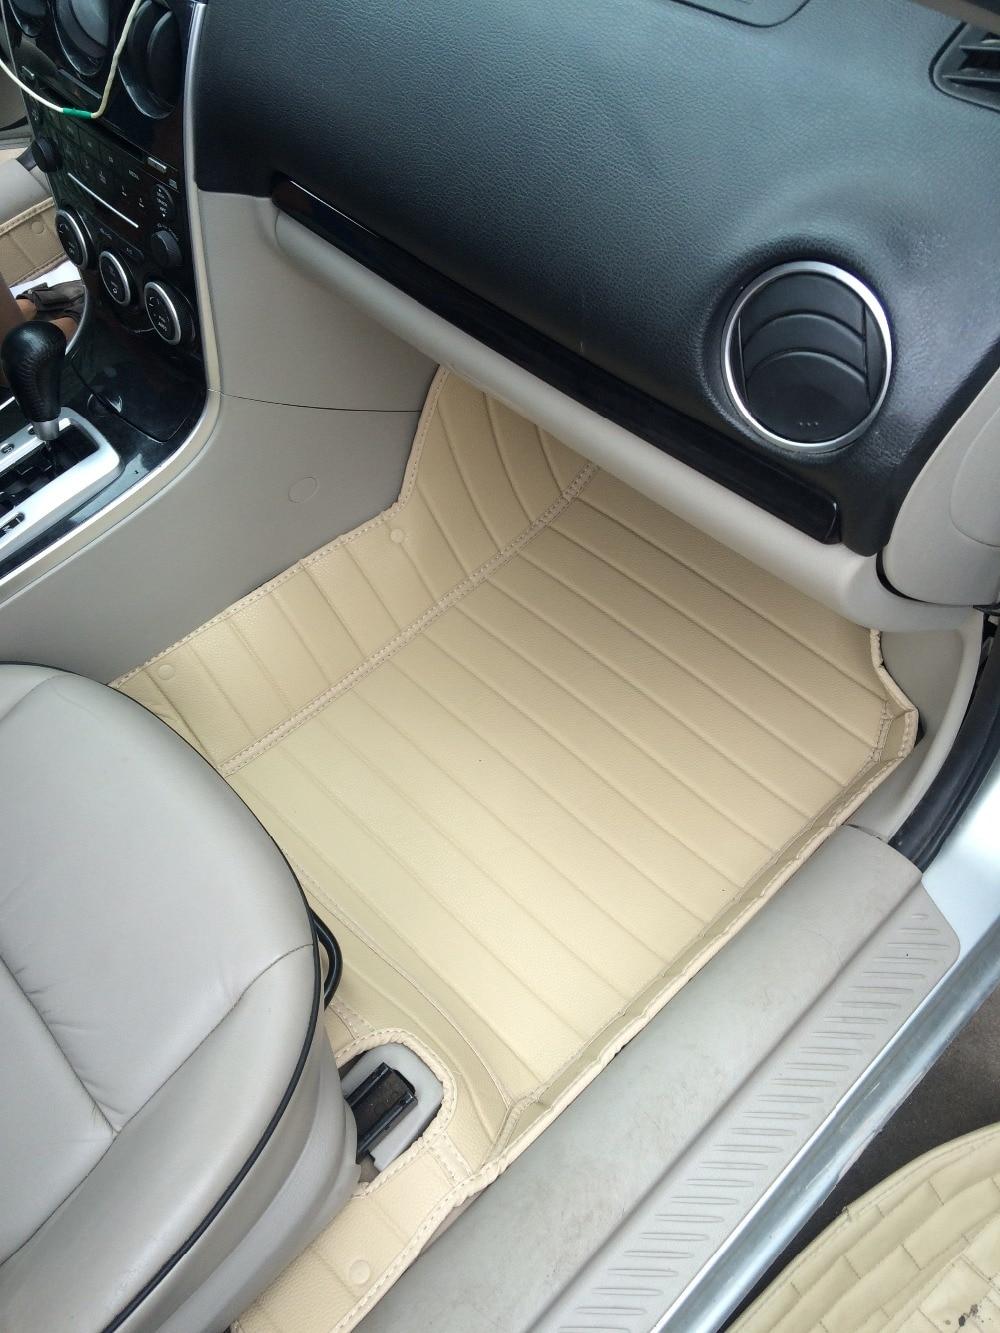 Custom waterproof special car floor mats for Mazda 6 5seats durable no odor carpets for 6 5seats special car waterproof latex rubber antiskid automobile floor mats for lc200 cruiser green no odor waterproof latex carpets